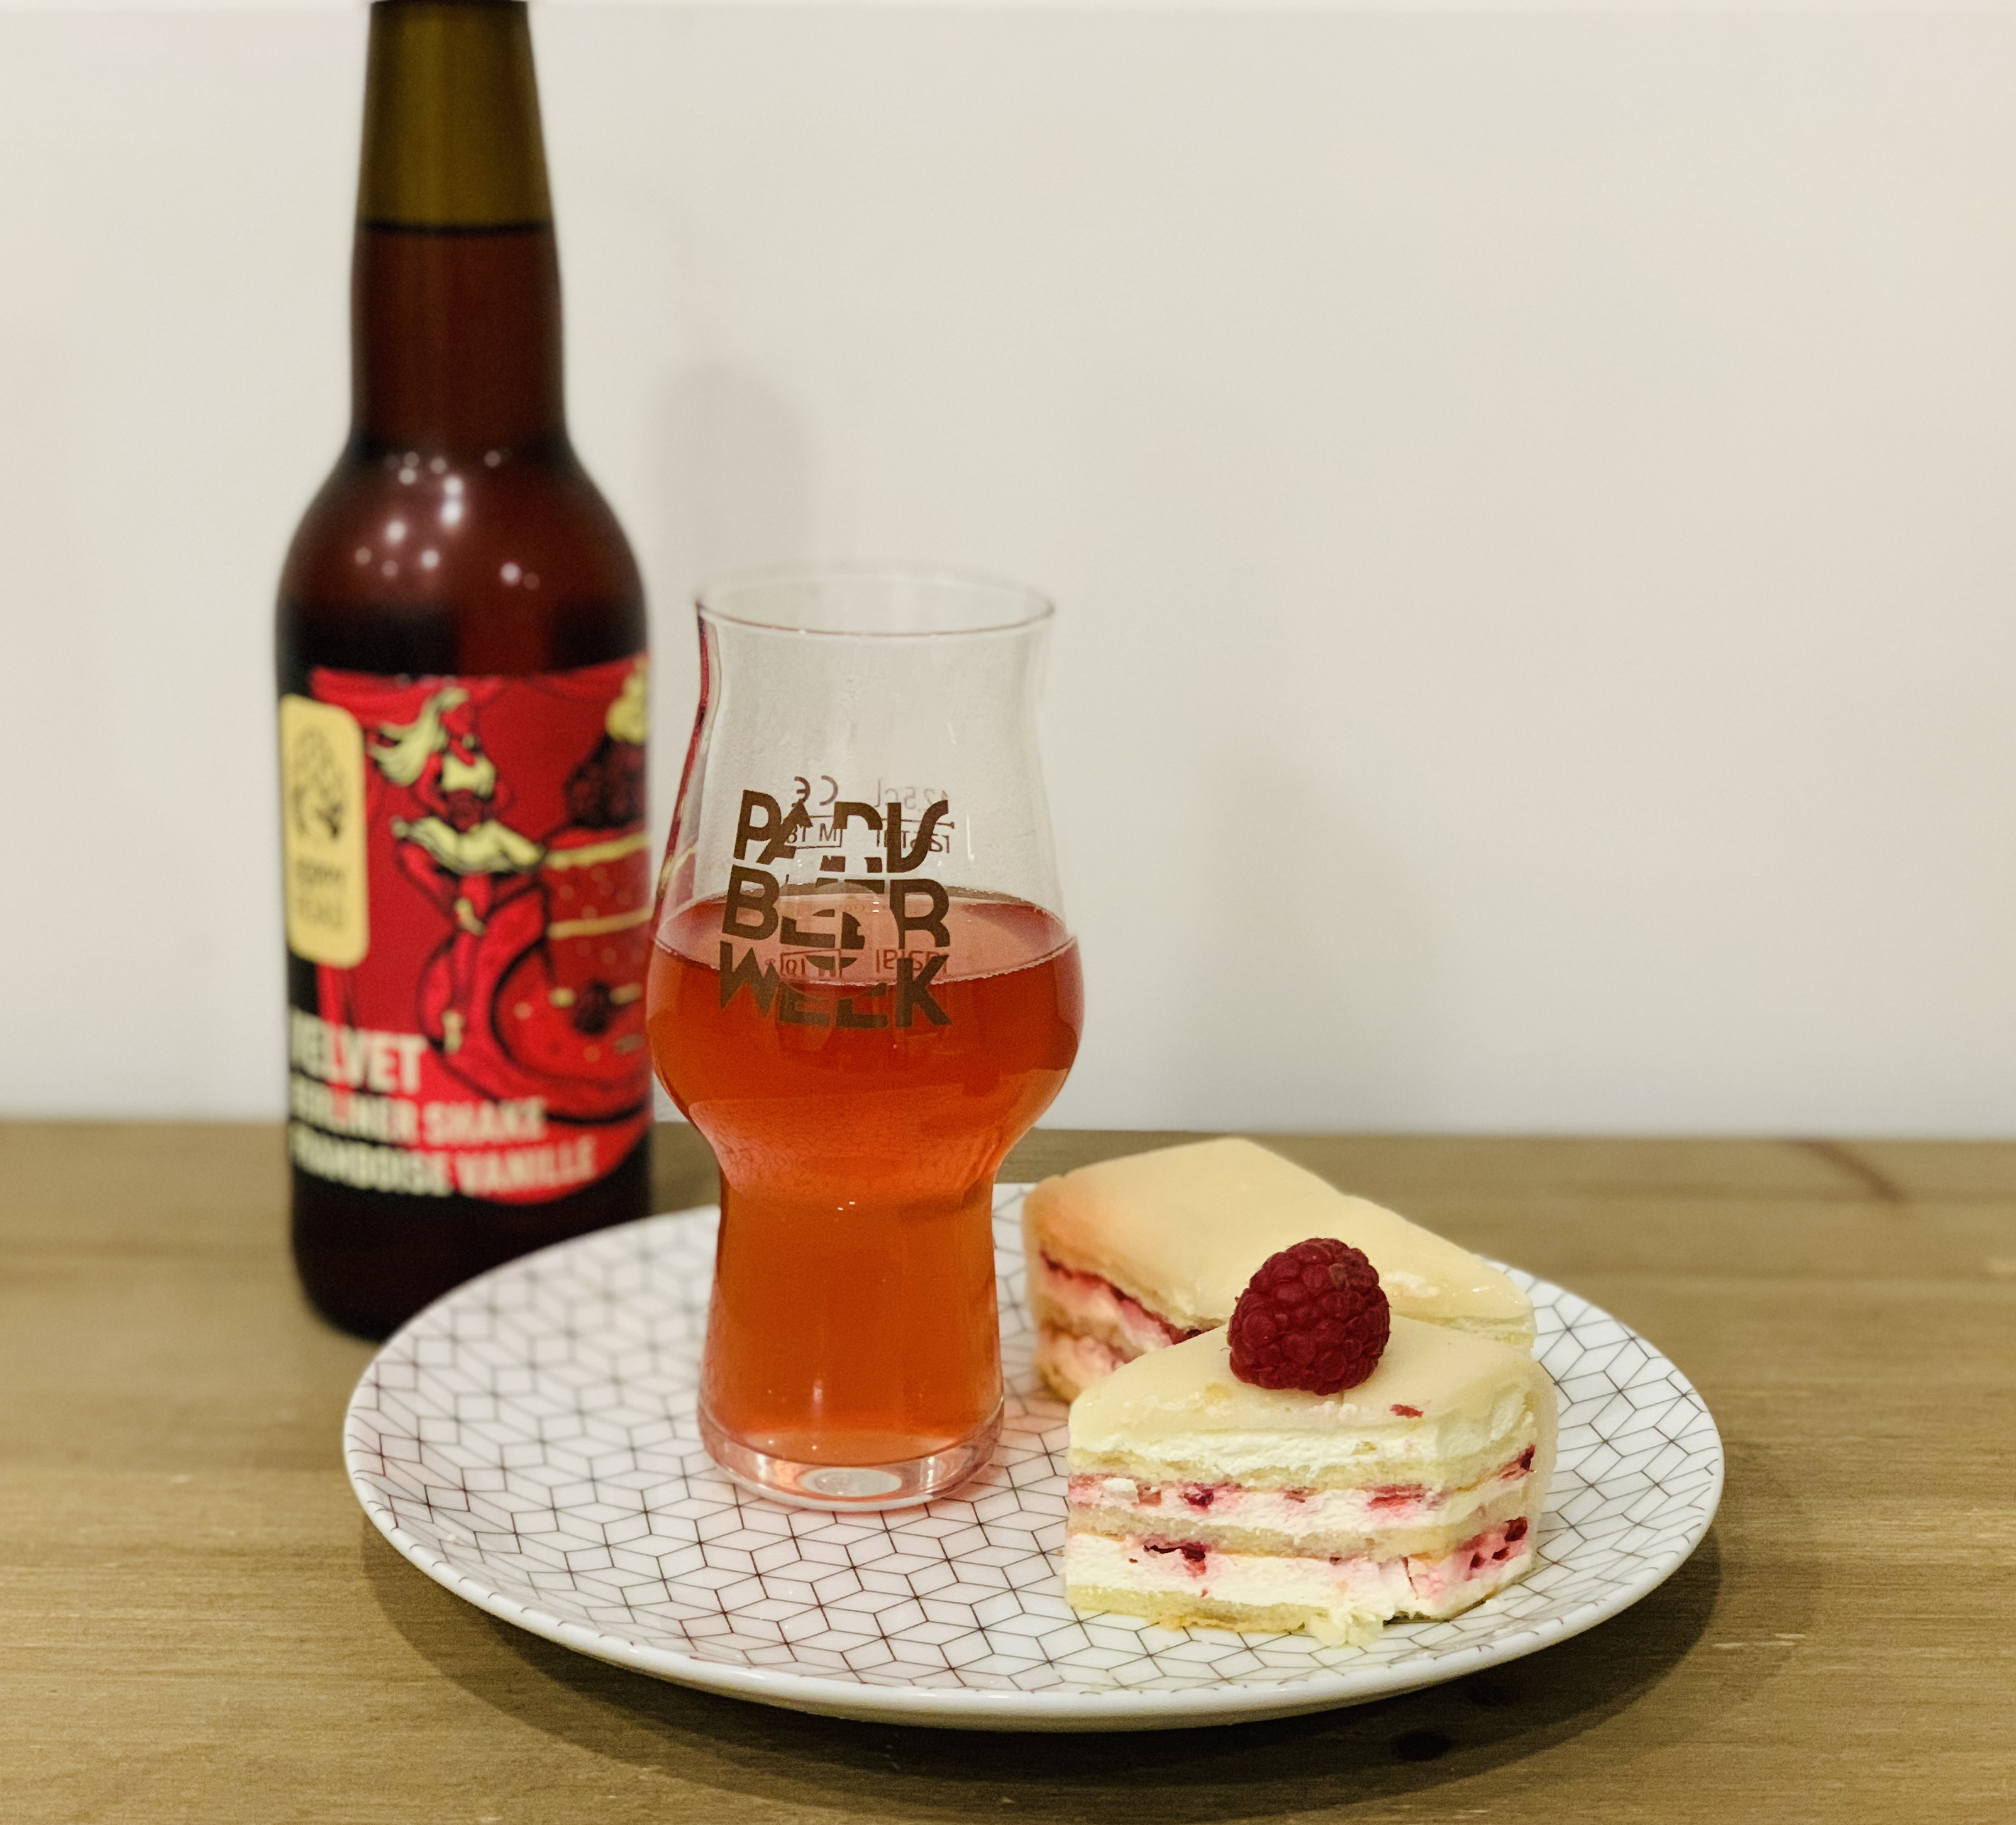 Accord tarte sucrée framboise & bière Berliner weisse